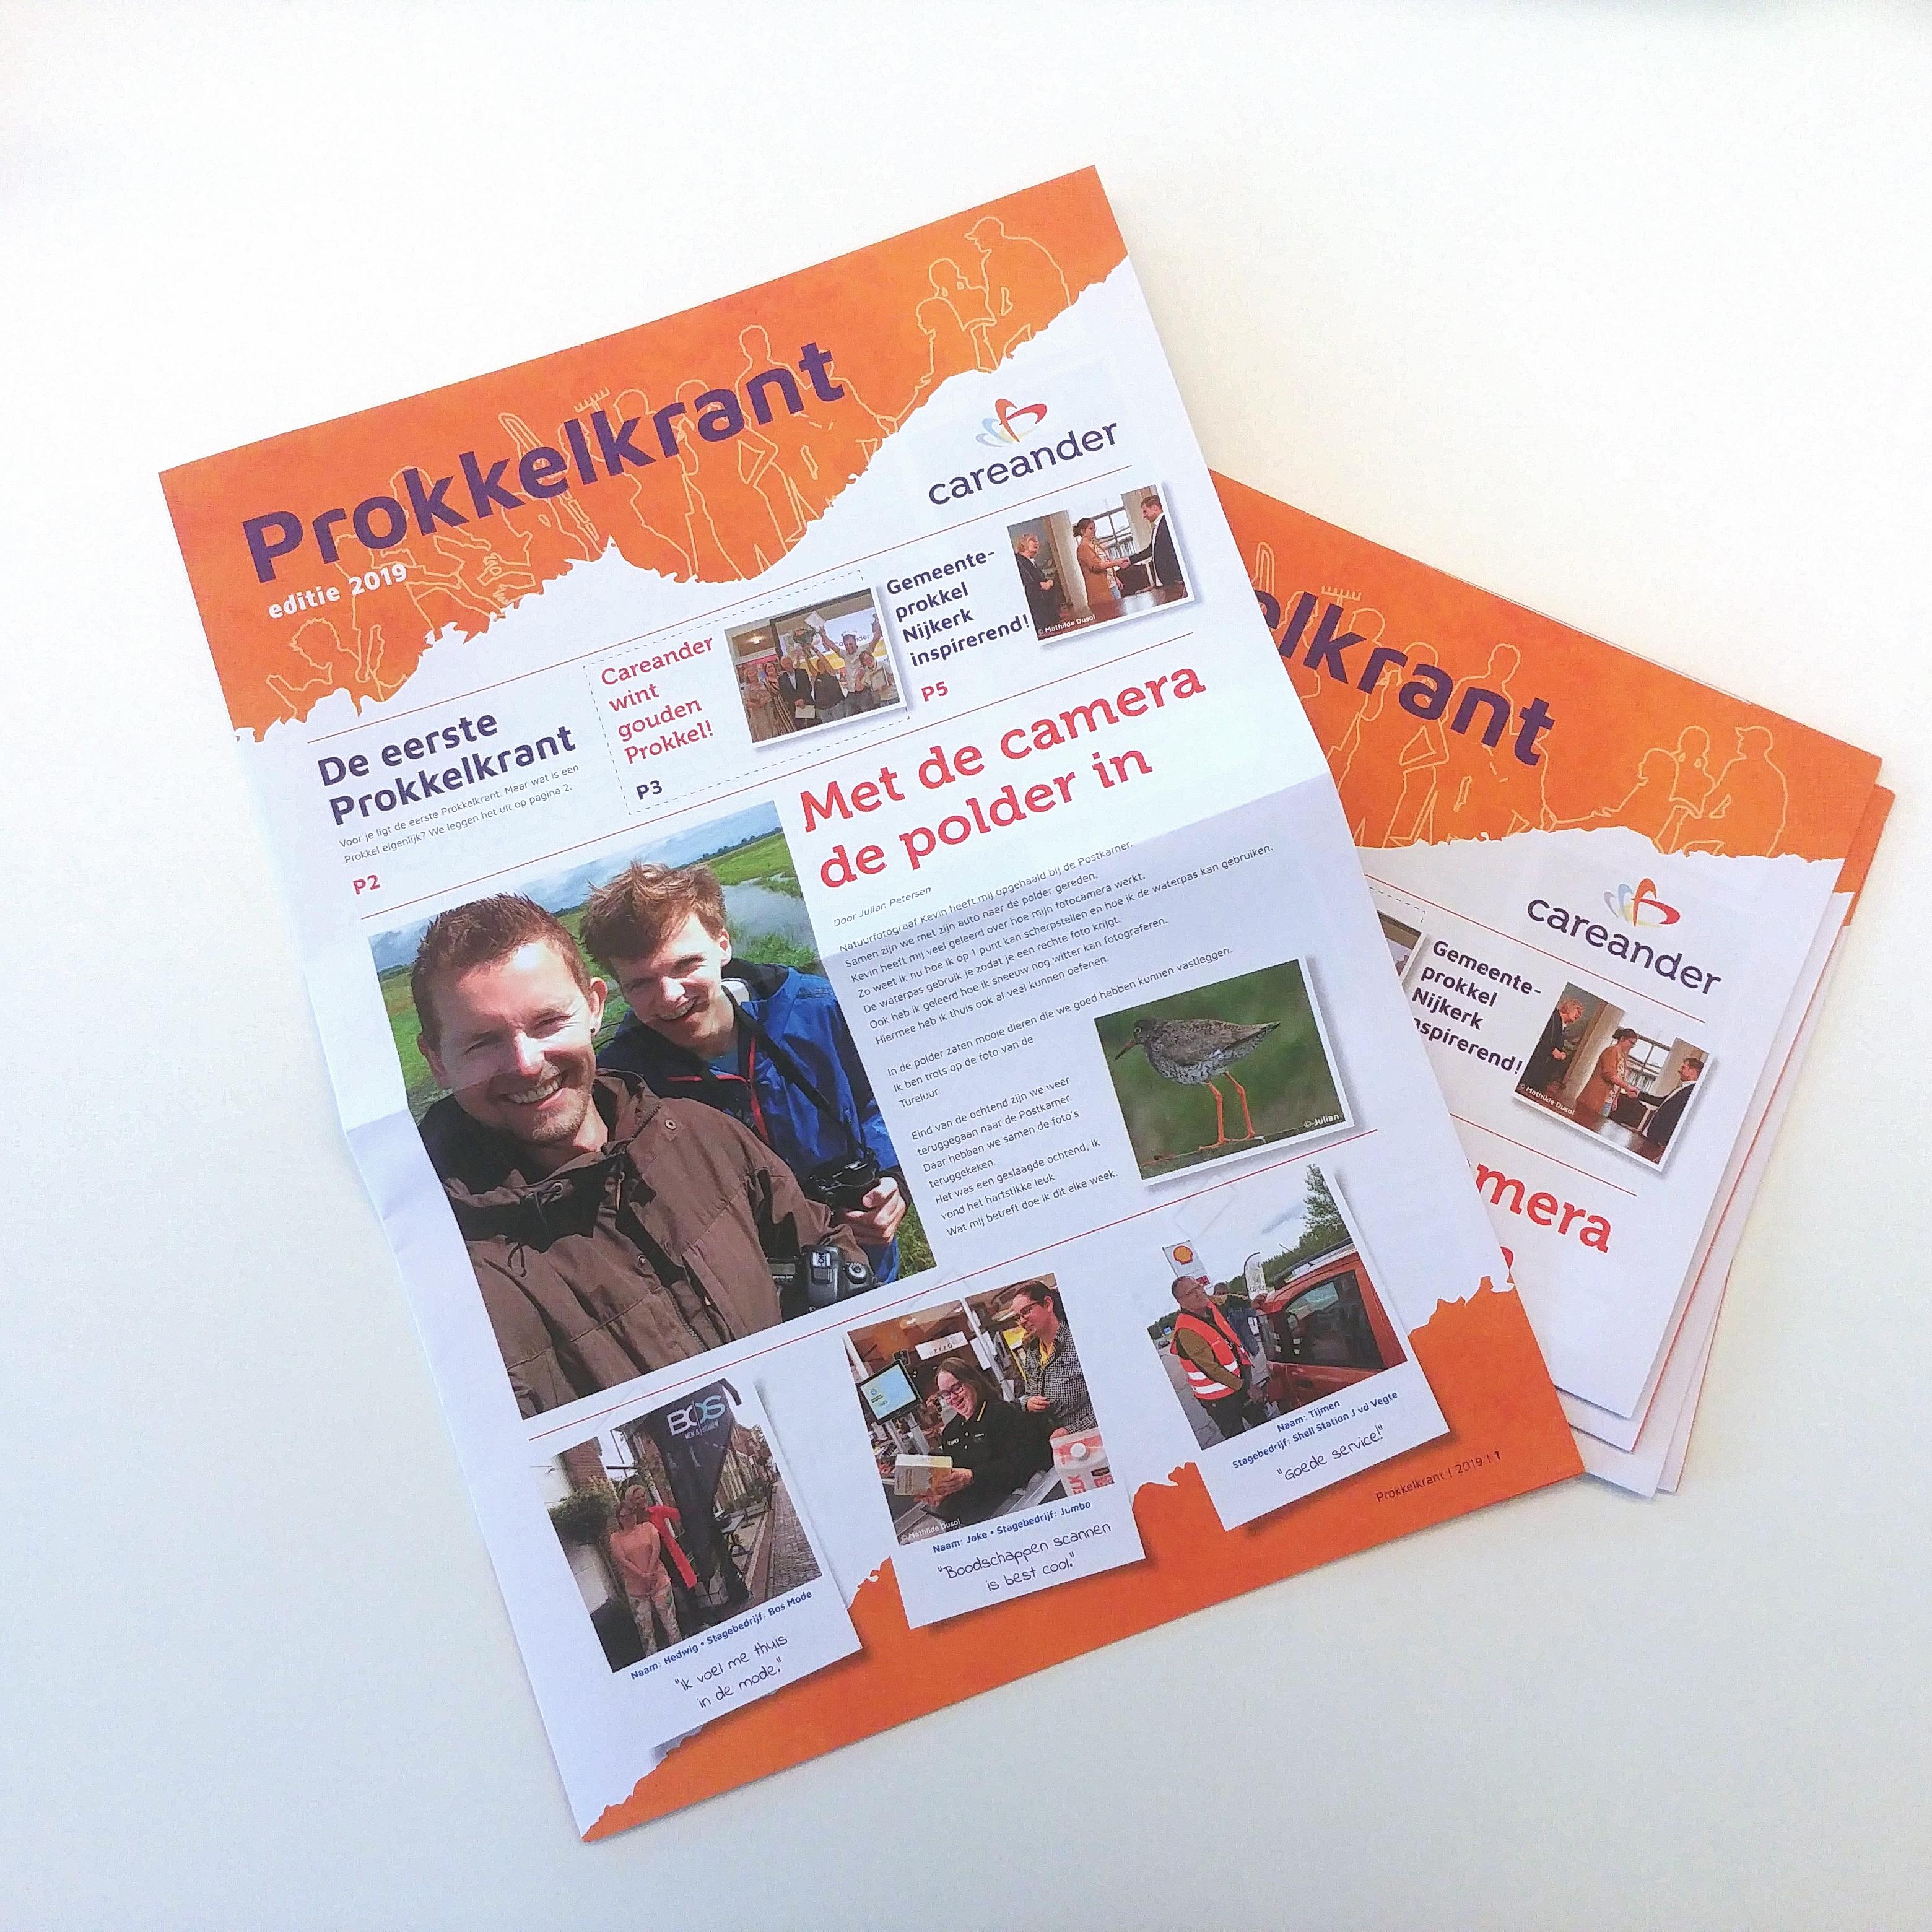 Careander - Prokkelkrant